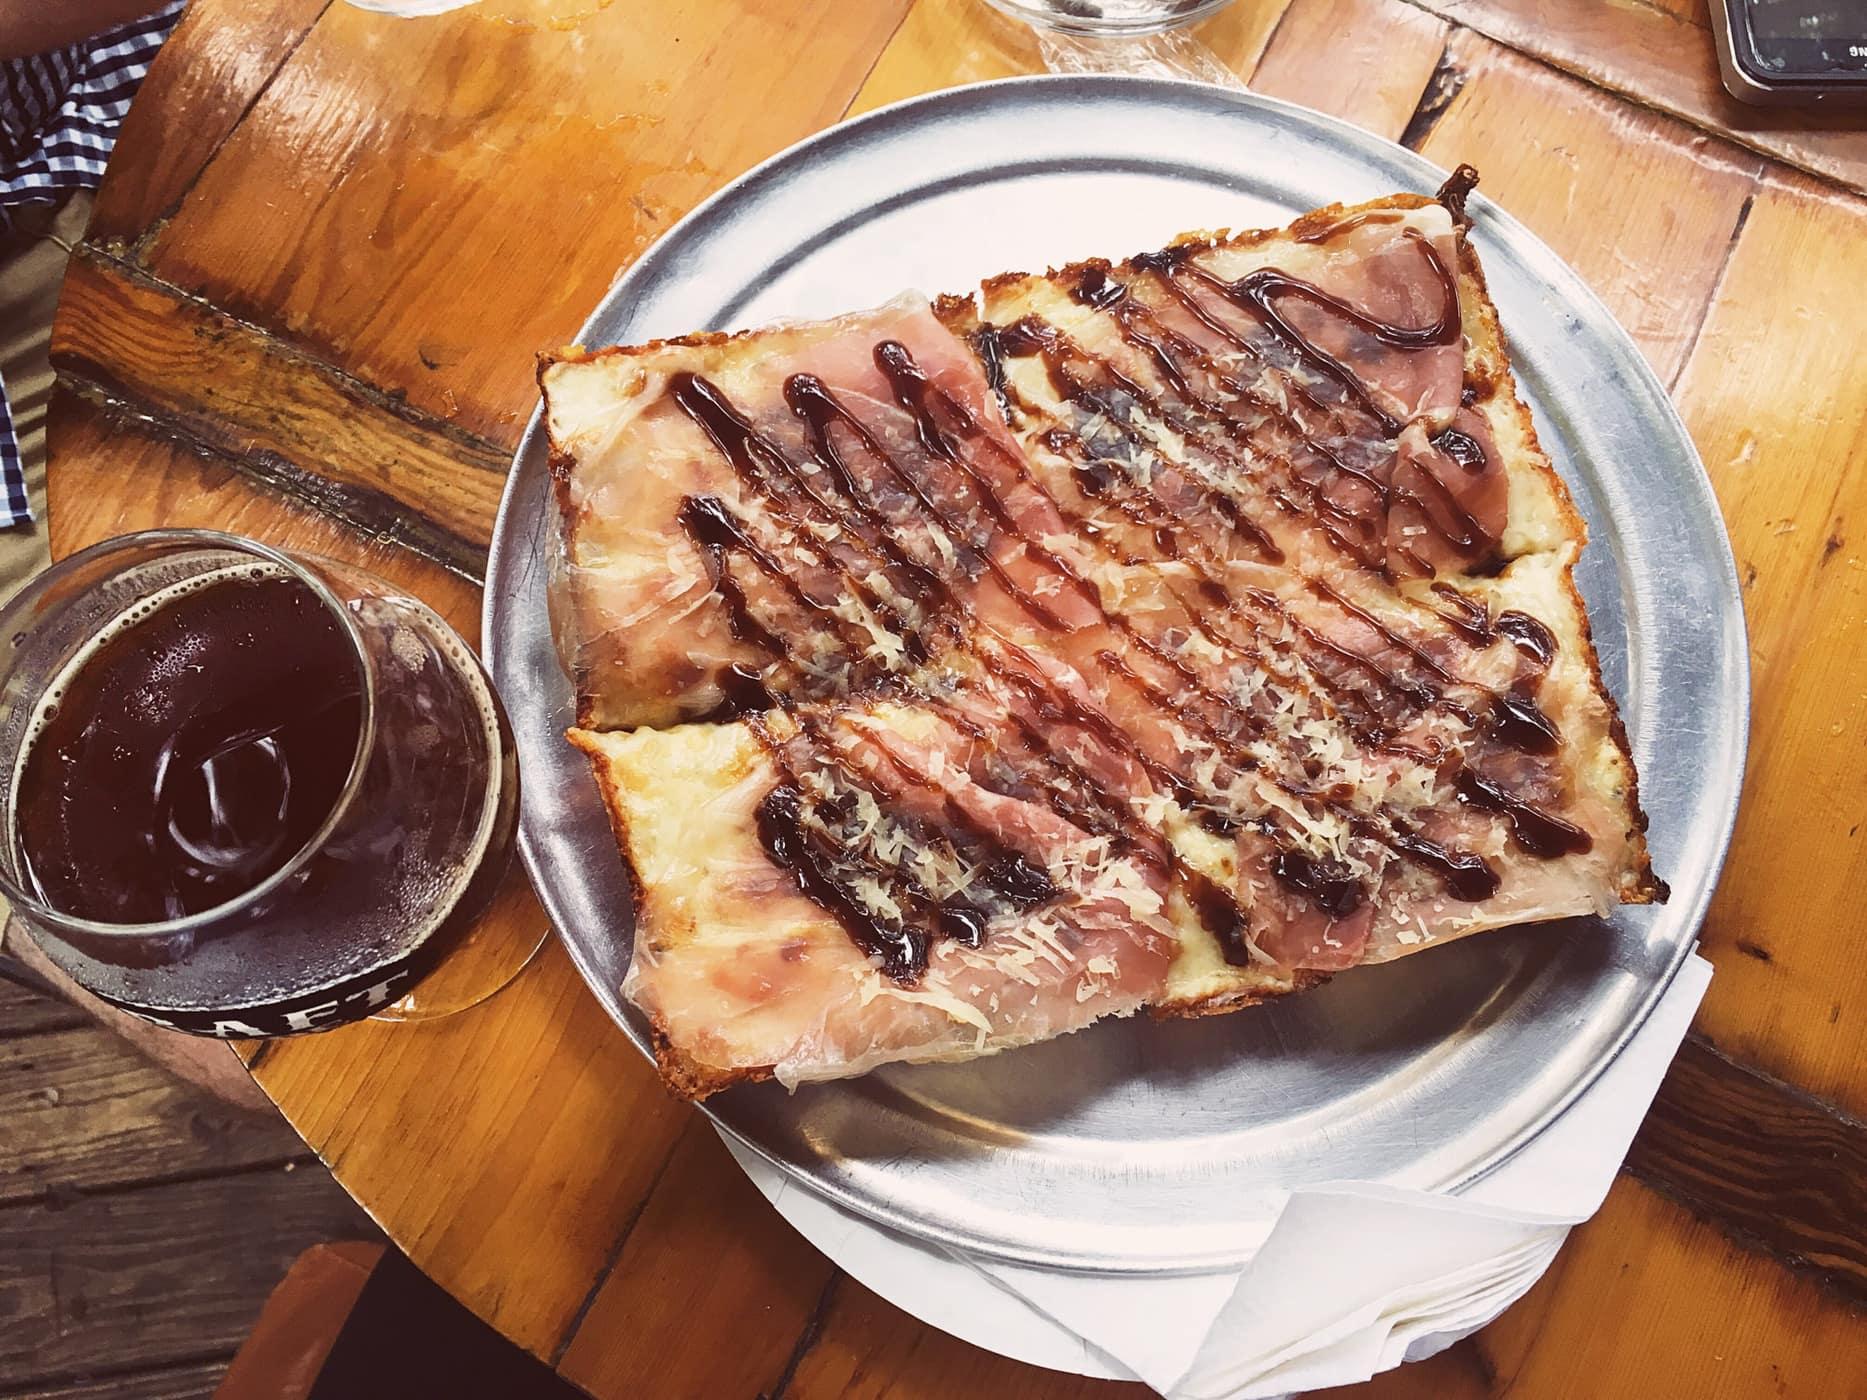 The Cadillac pizza (Gorgonzola, Fig Preserves, Prosciutto di Parma, Parmesan, Balsamic Glaze) at Via 313 in Austin, Texas.